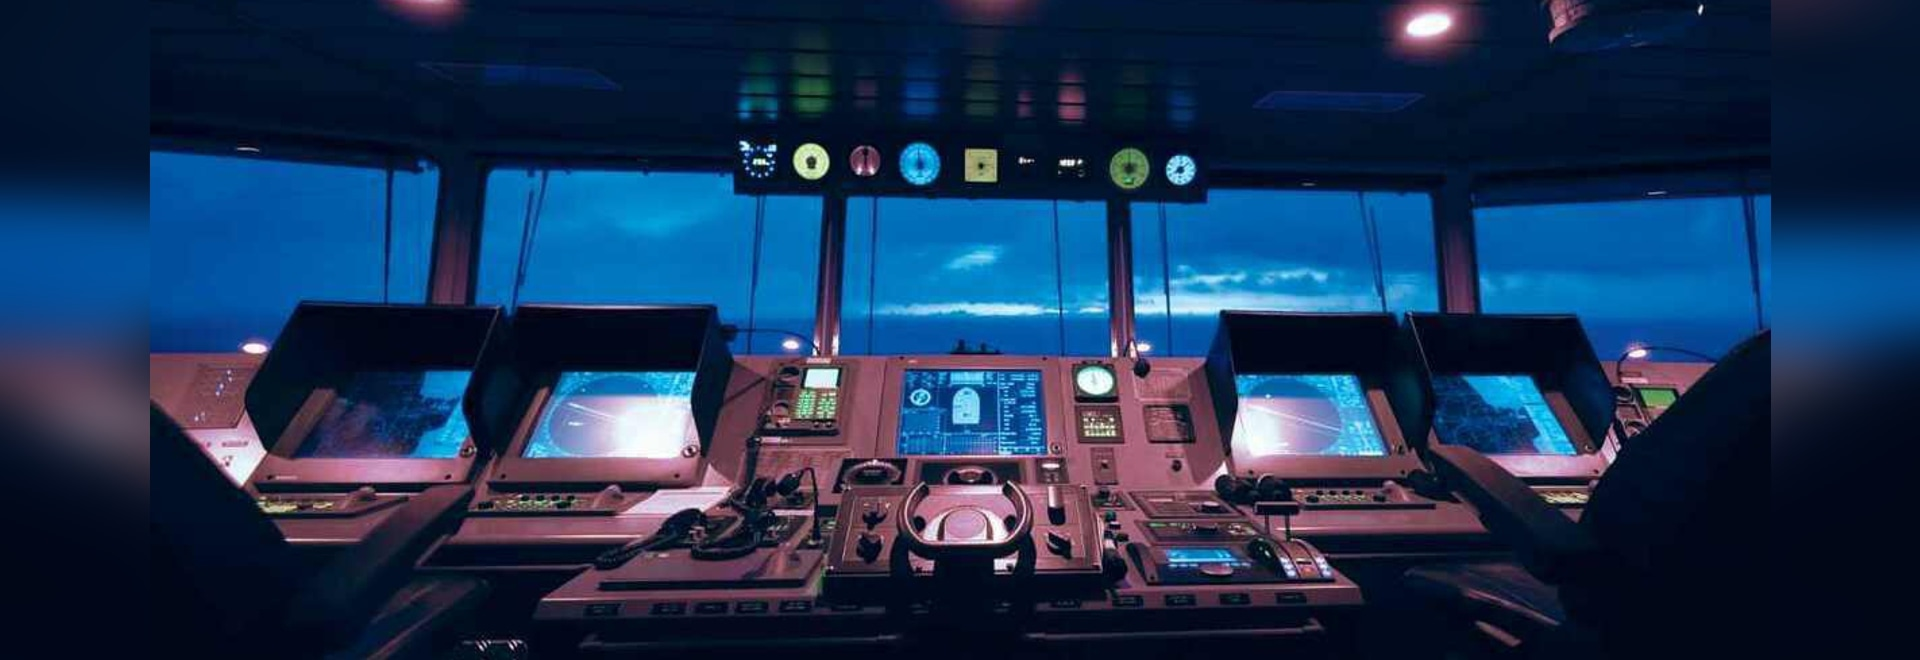 Marlink introduced Bridgelink to link bridge OT in one unifying platform